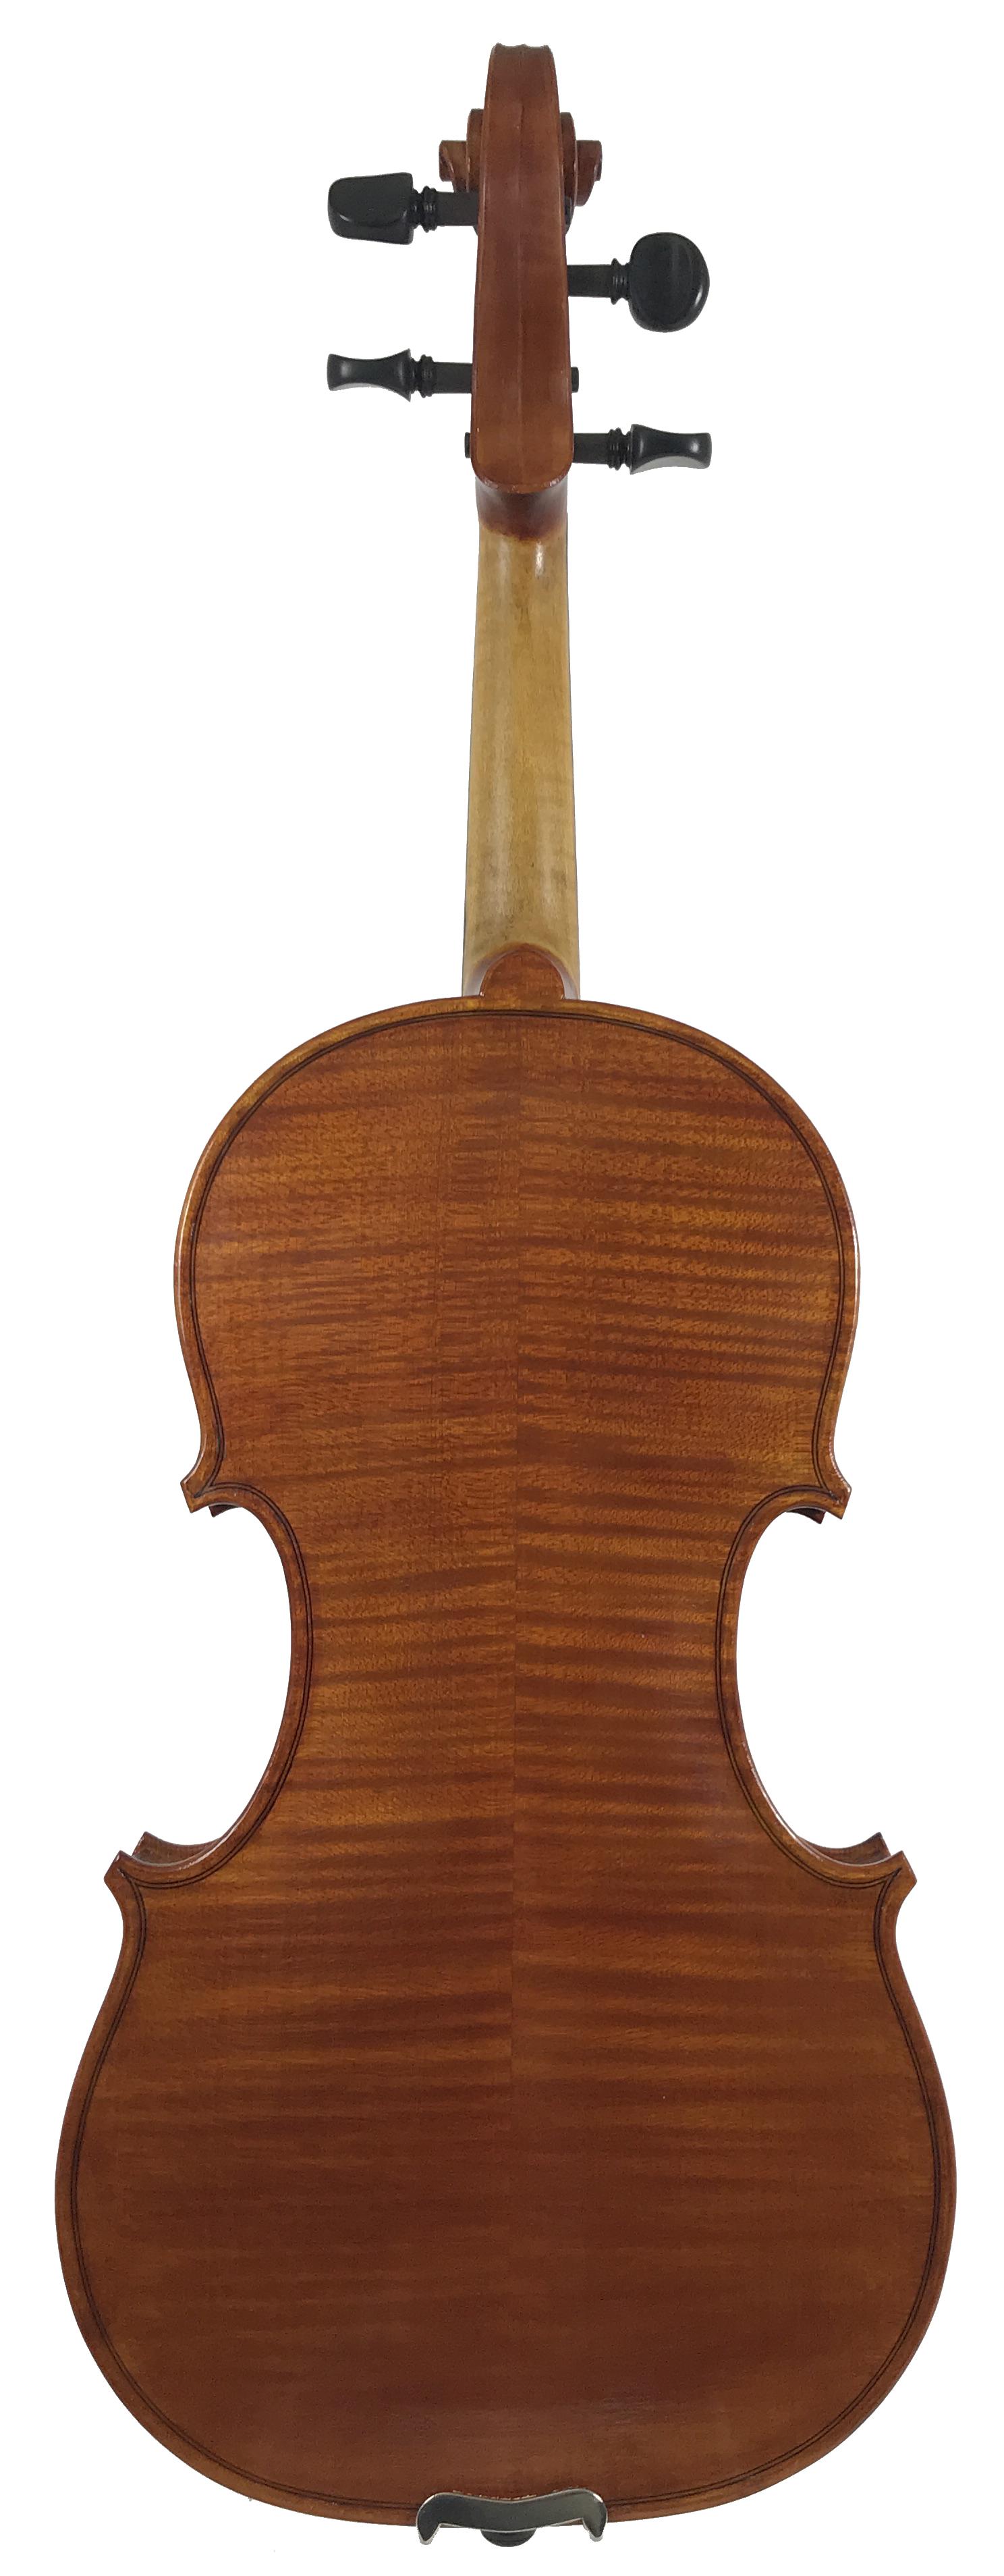 Chicago School of Violin Making